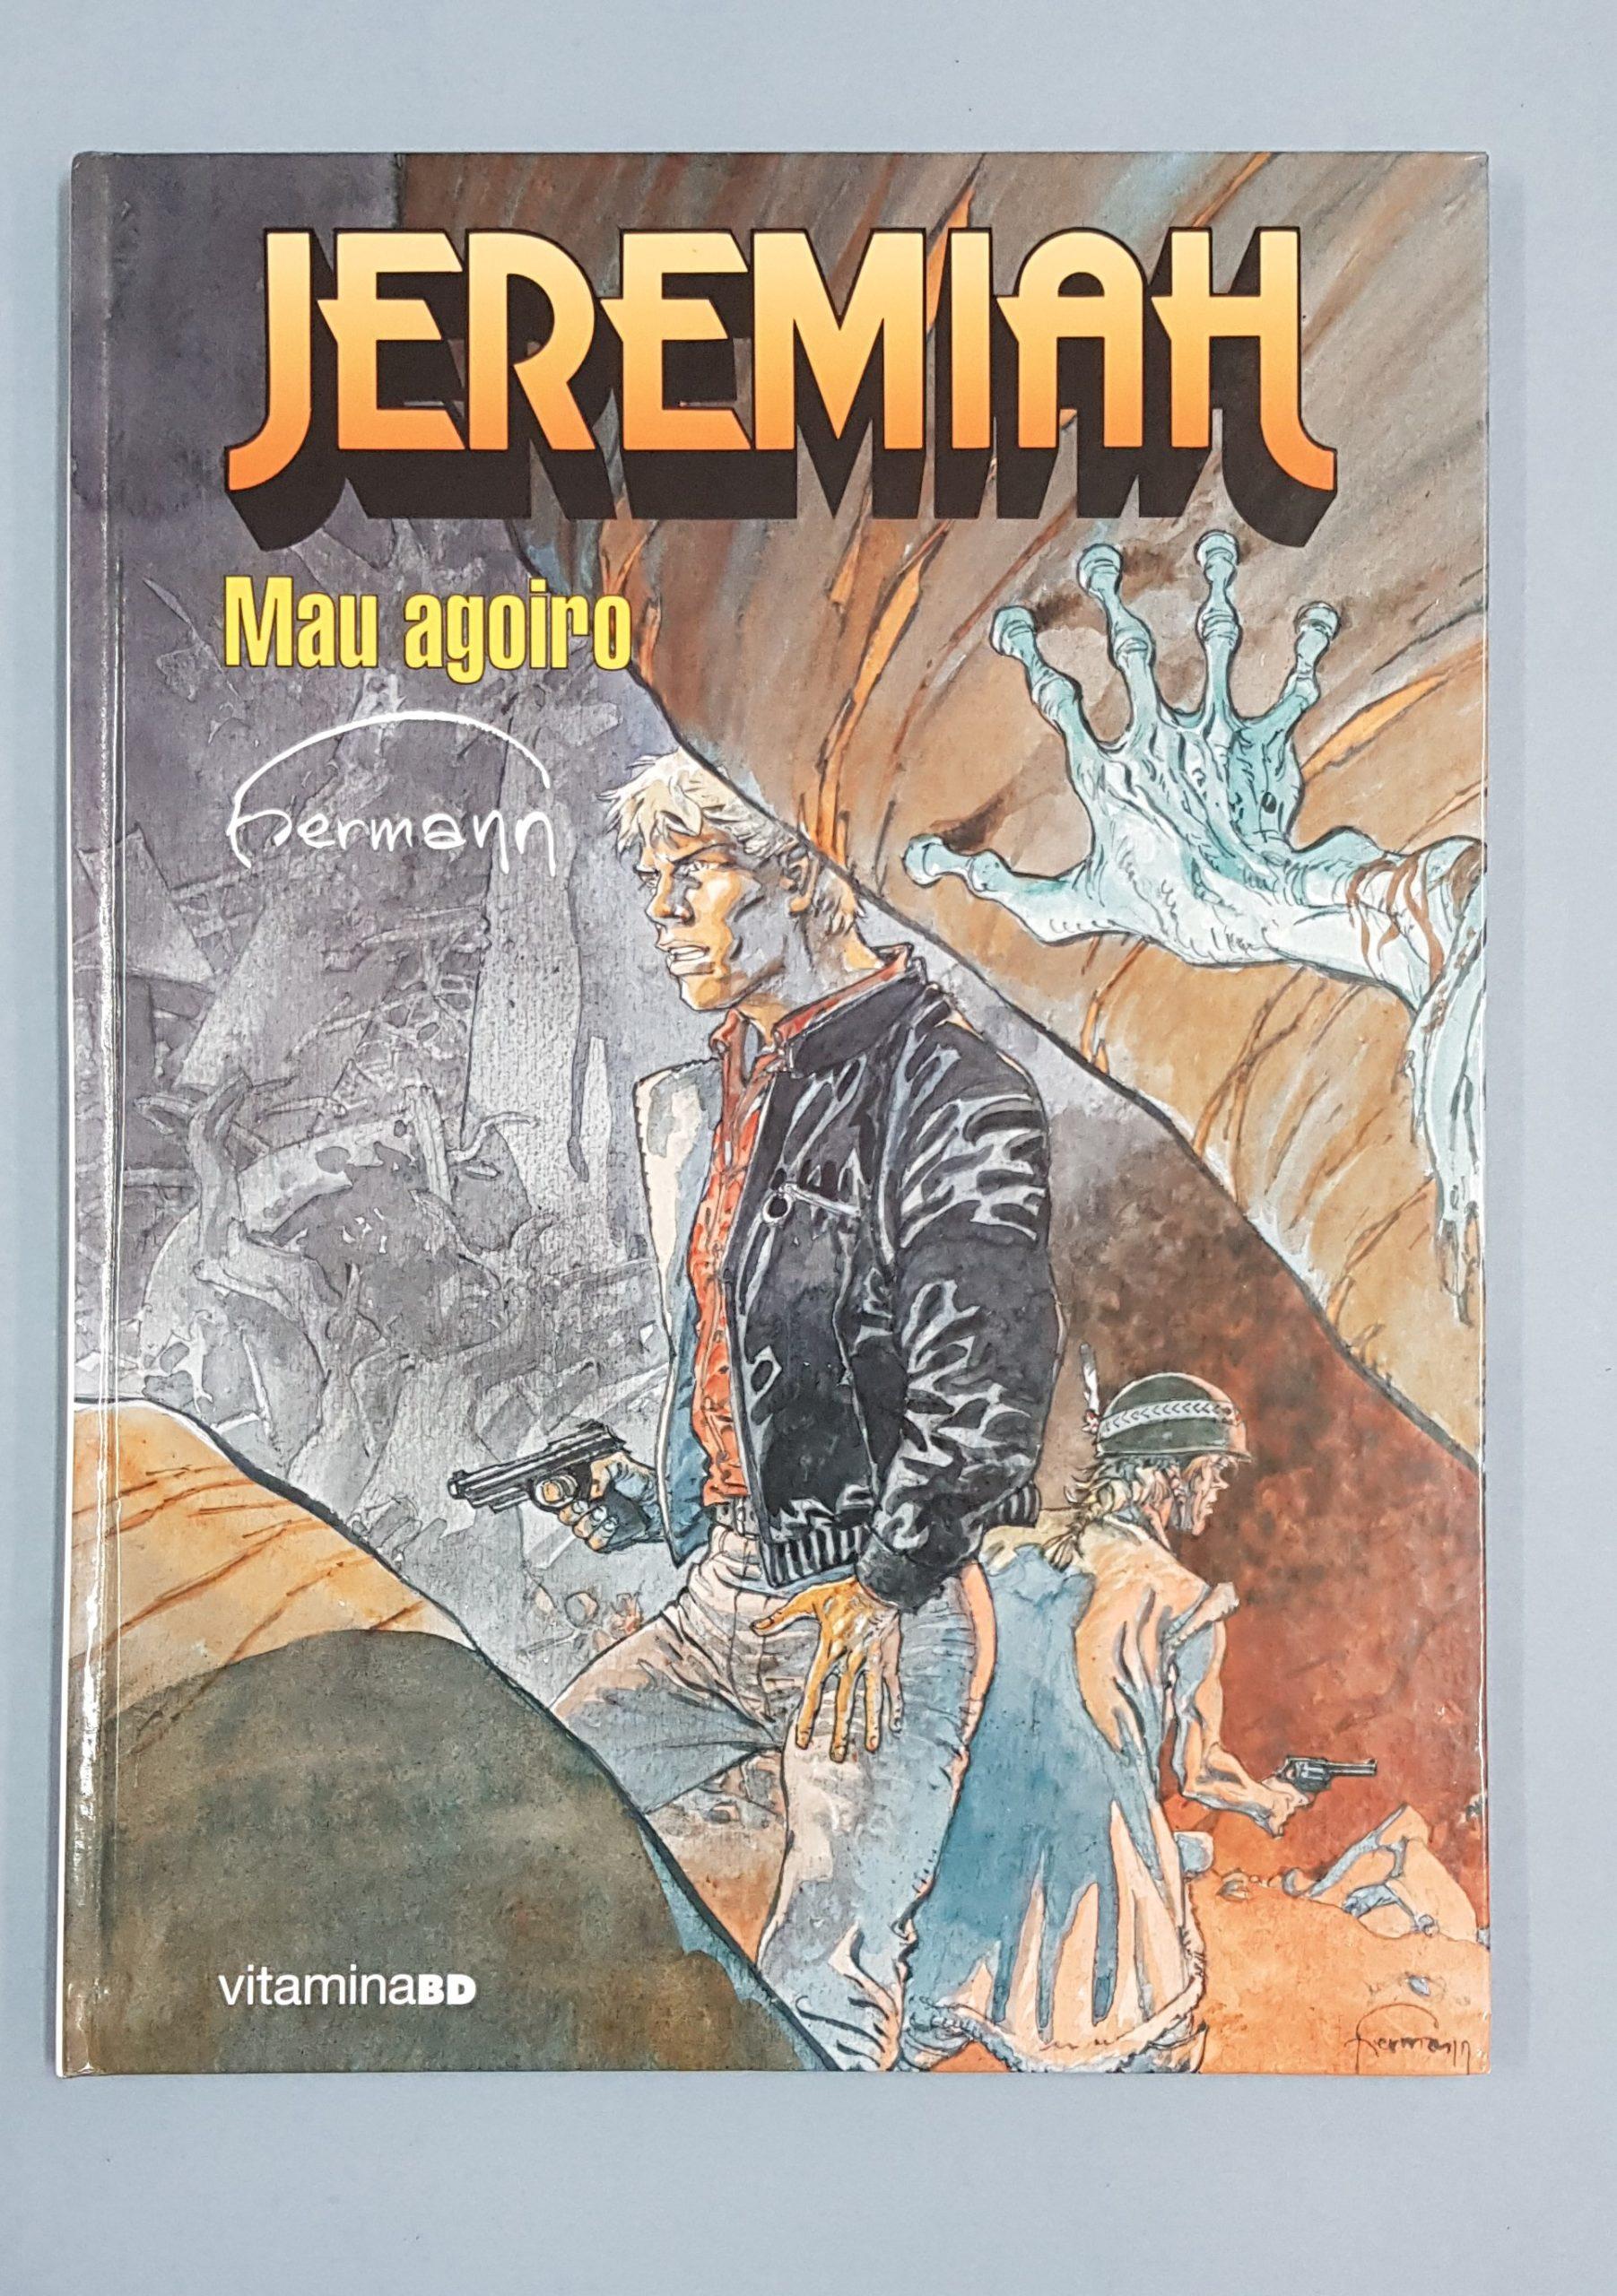 JEREMIAH – MAU AGOIRO